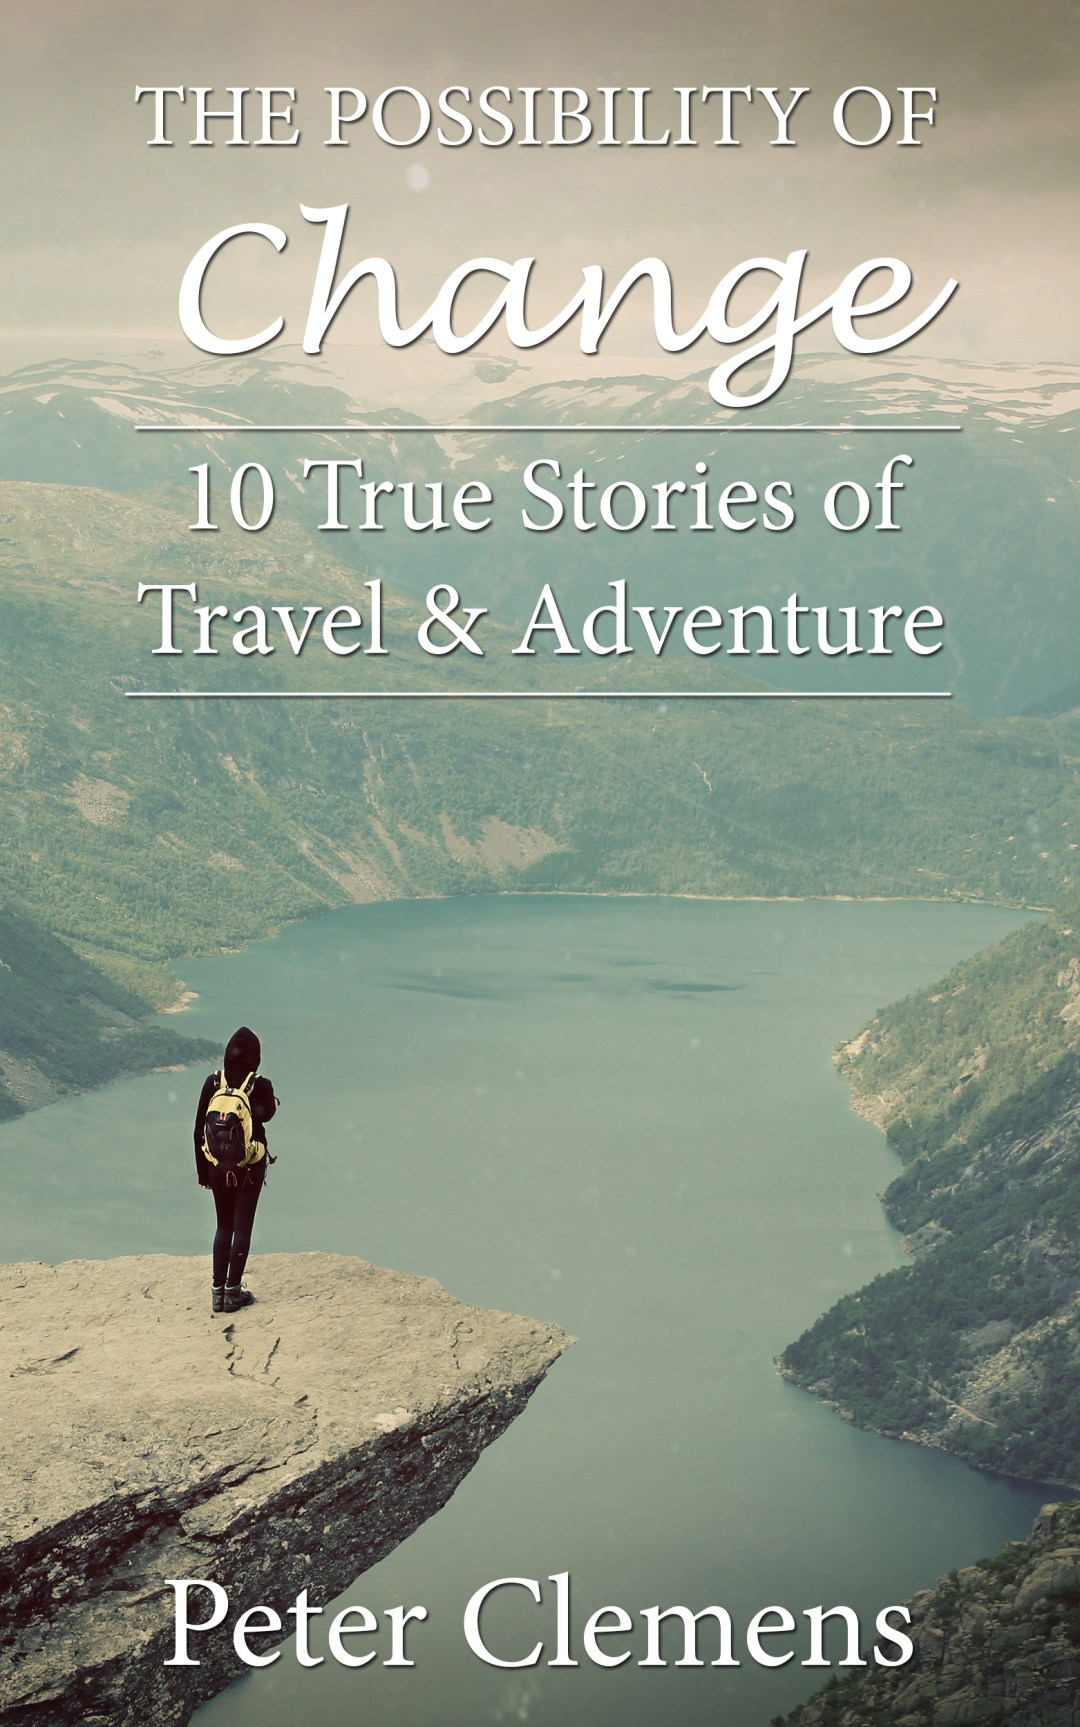 10 True Stories of Travel & Adventure